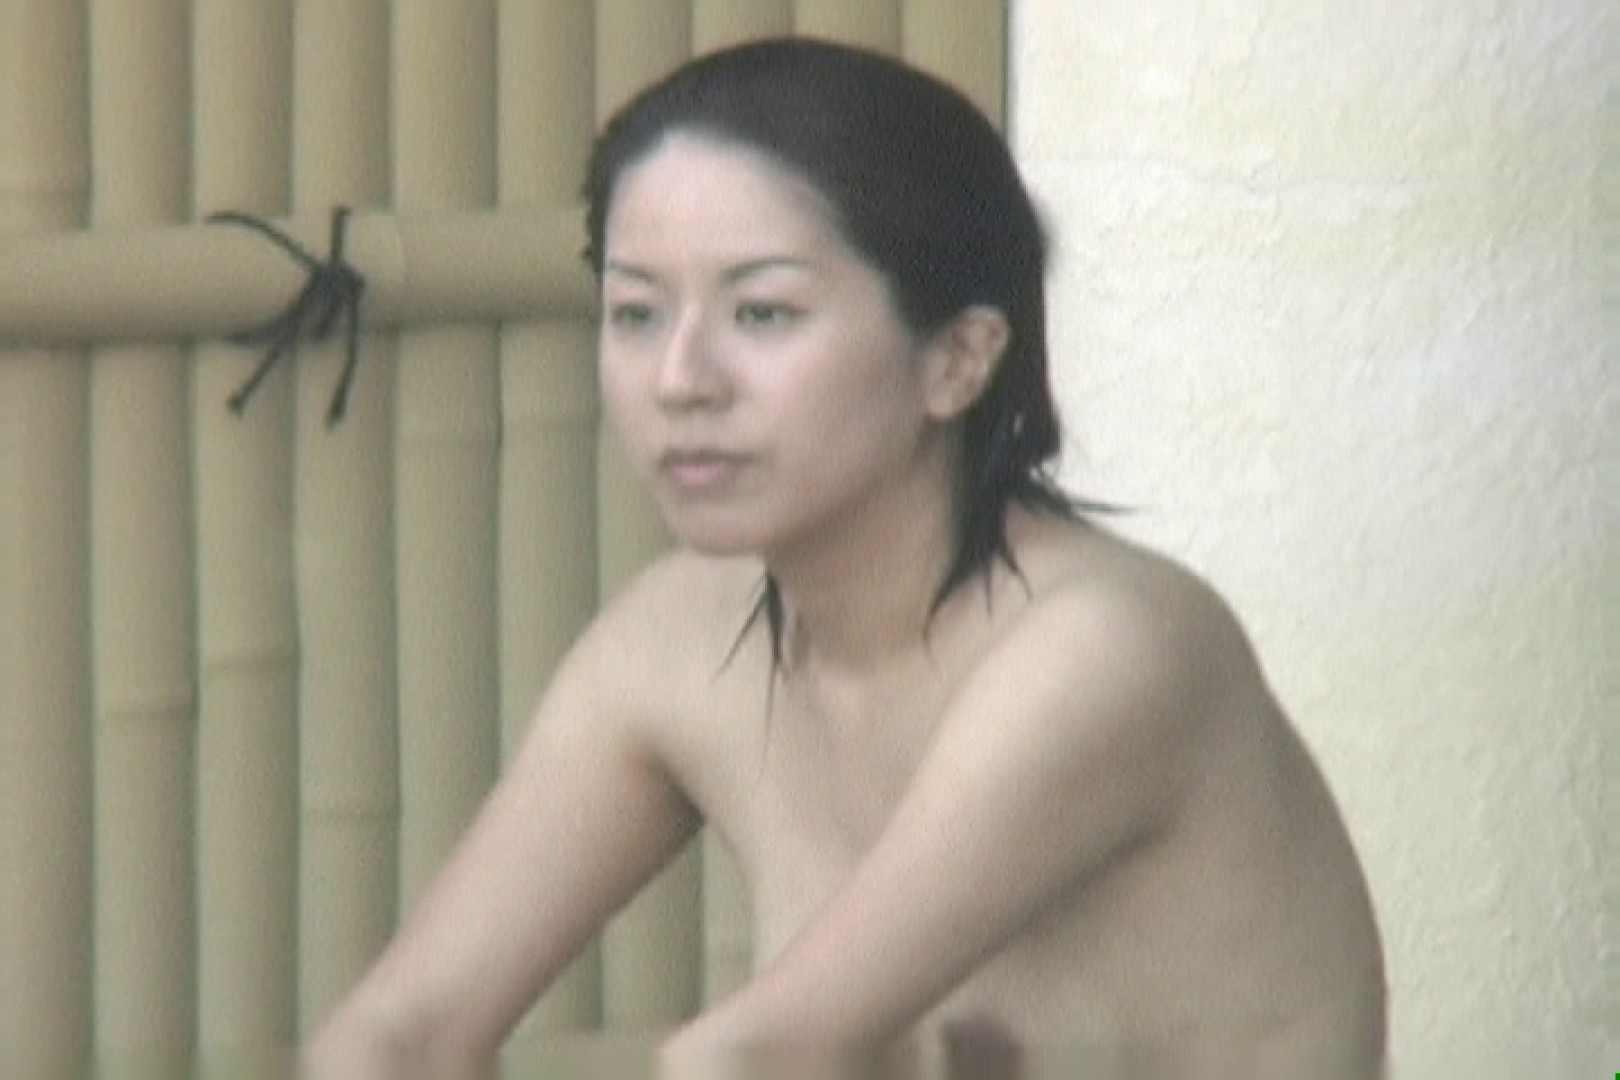 Aquaな露天風呂Vol.694 盗撮 | OLエロ画像  110PICs 10